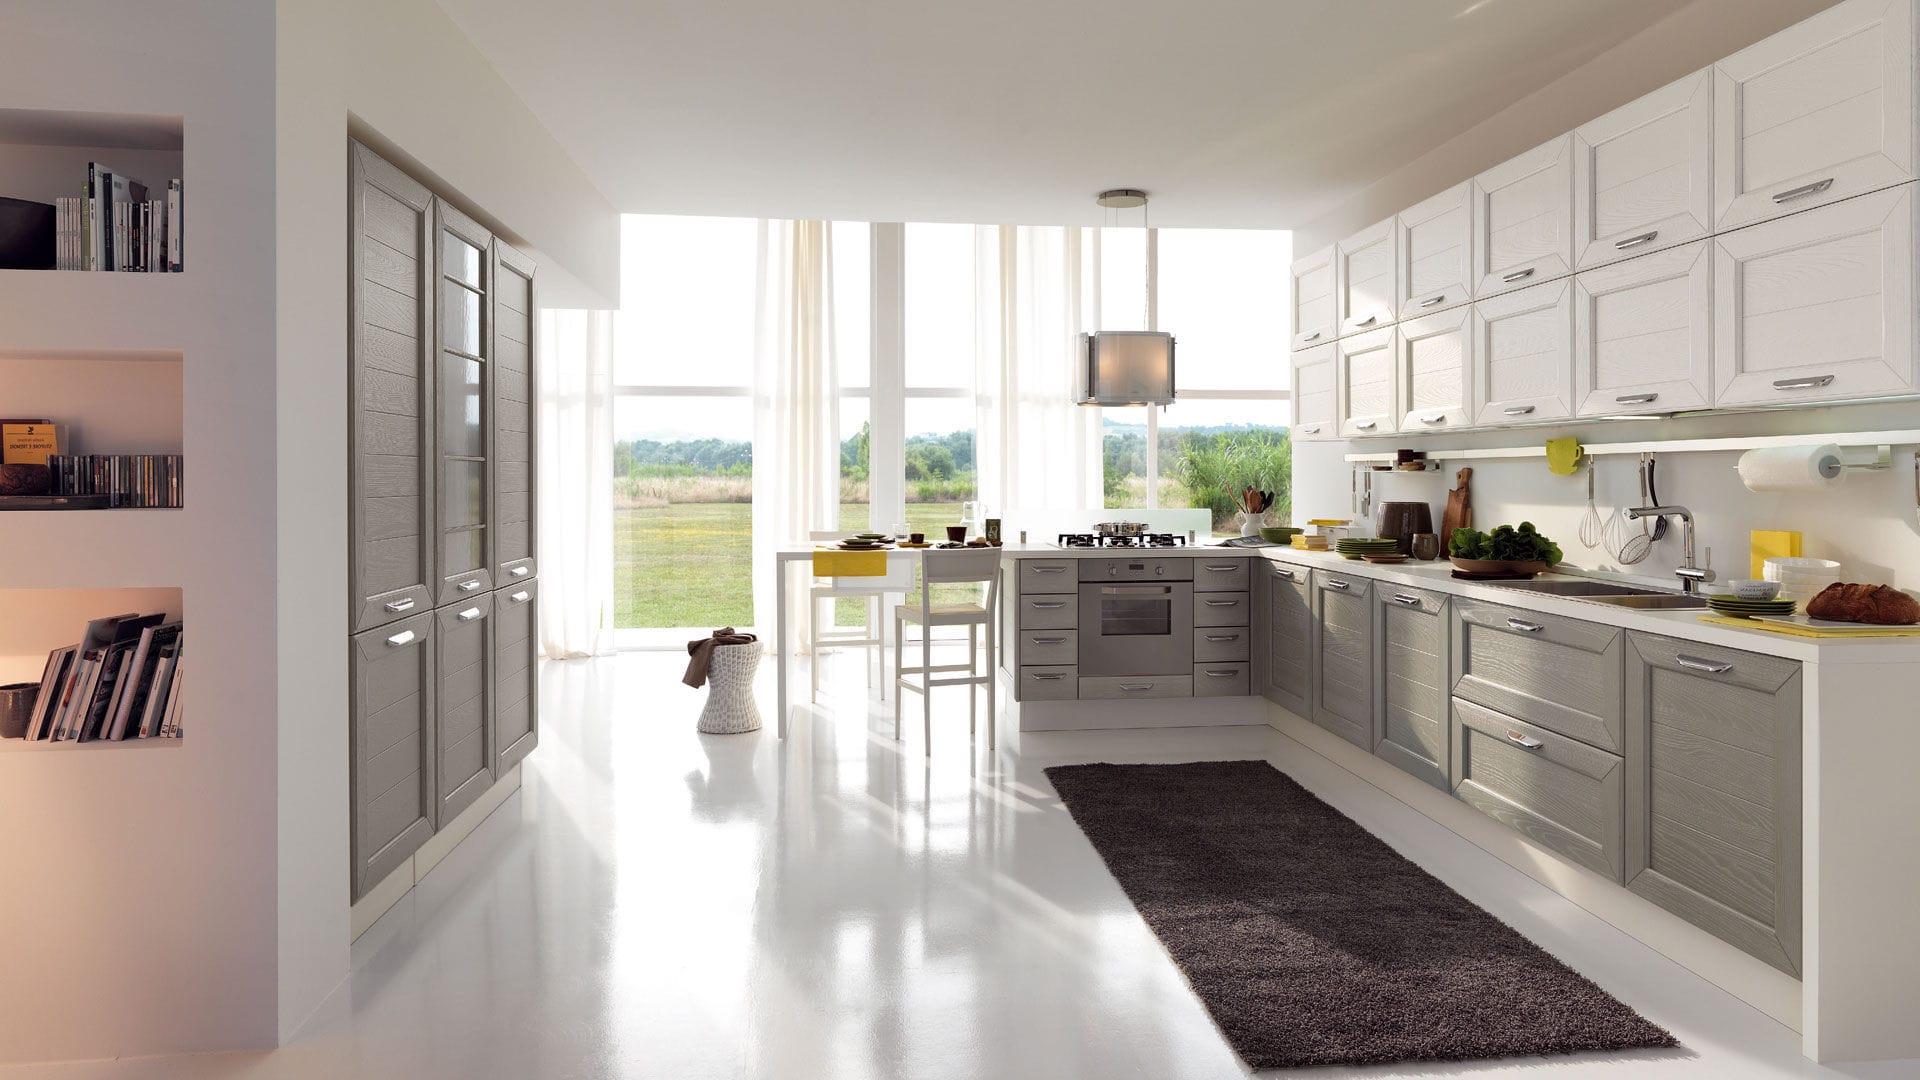 Cucina moderna / in legno / con impugnature - CLAUDIA - CUCINE LUBE ...